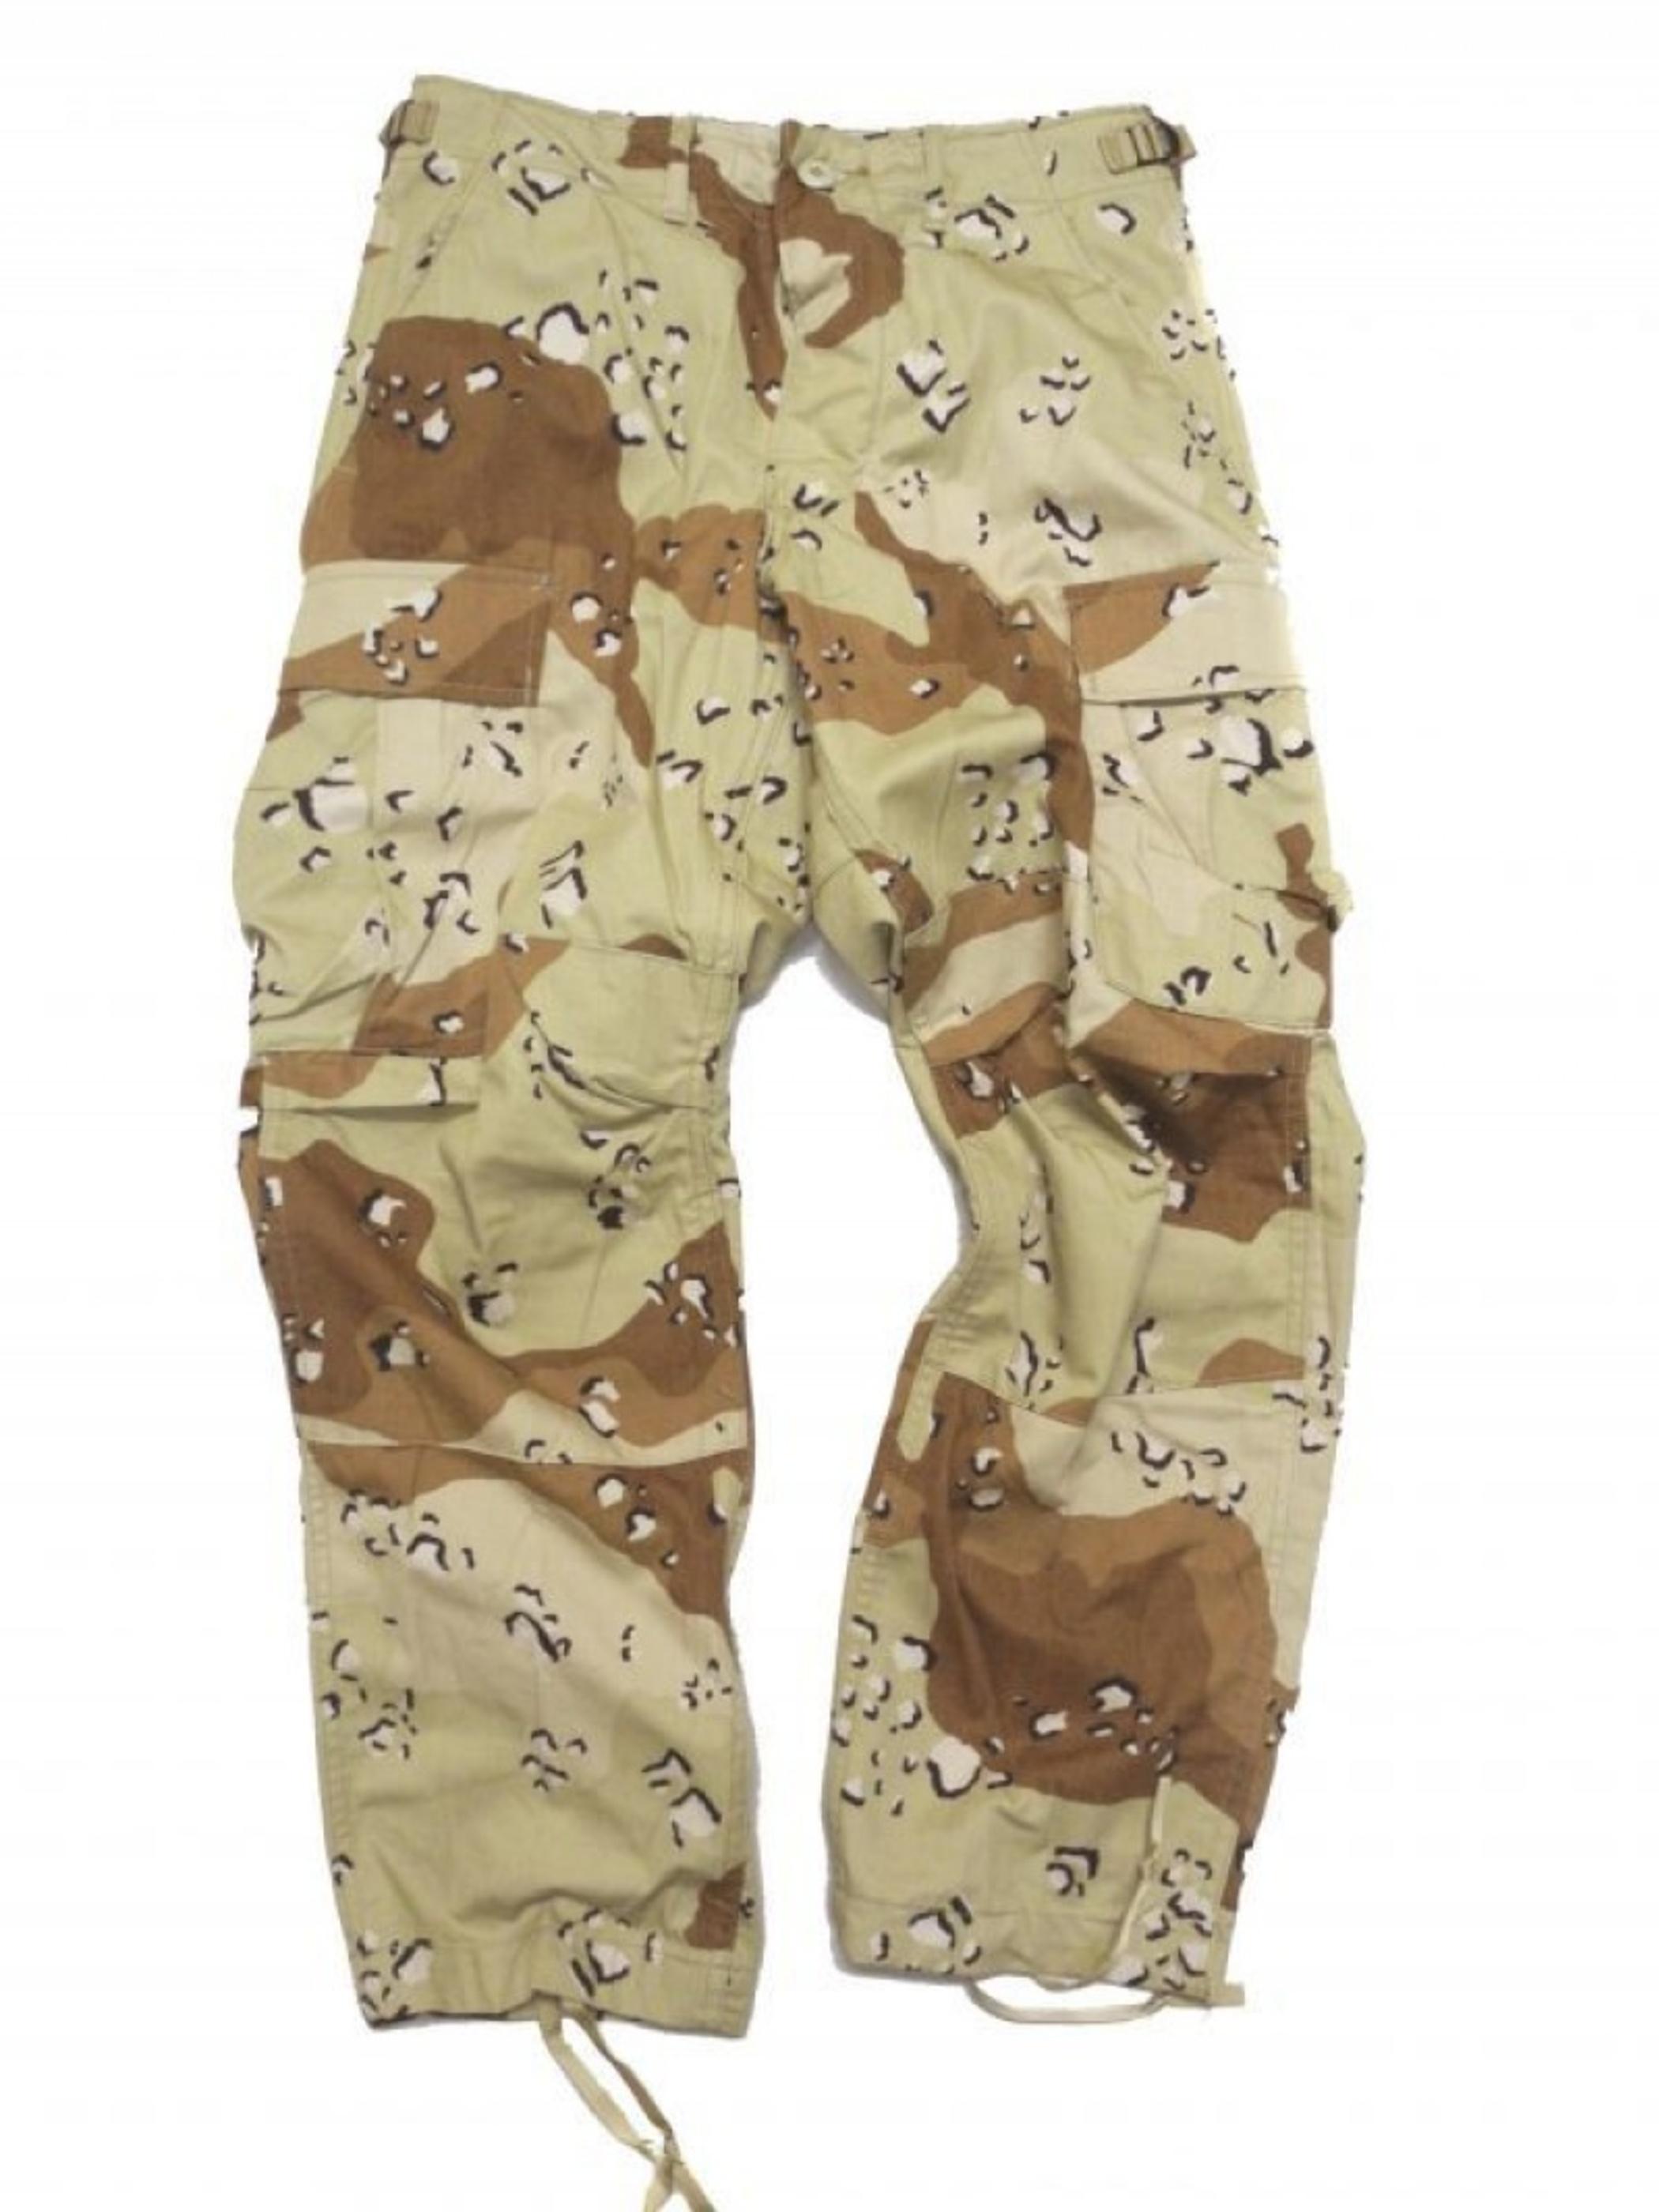 DEADSTOCK US ARMY 6C DEASERT CAMO BDU PANTS